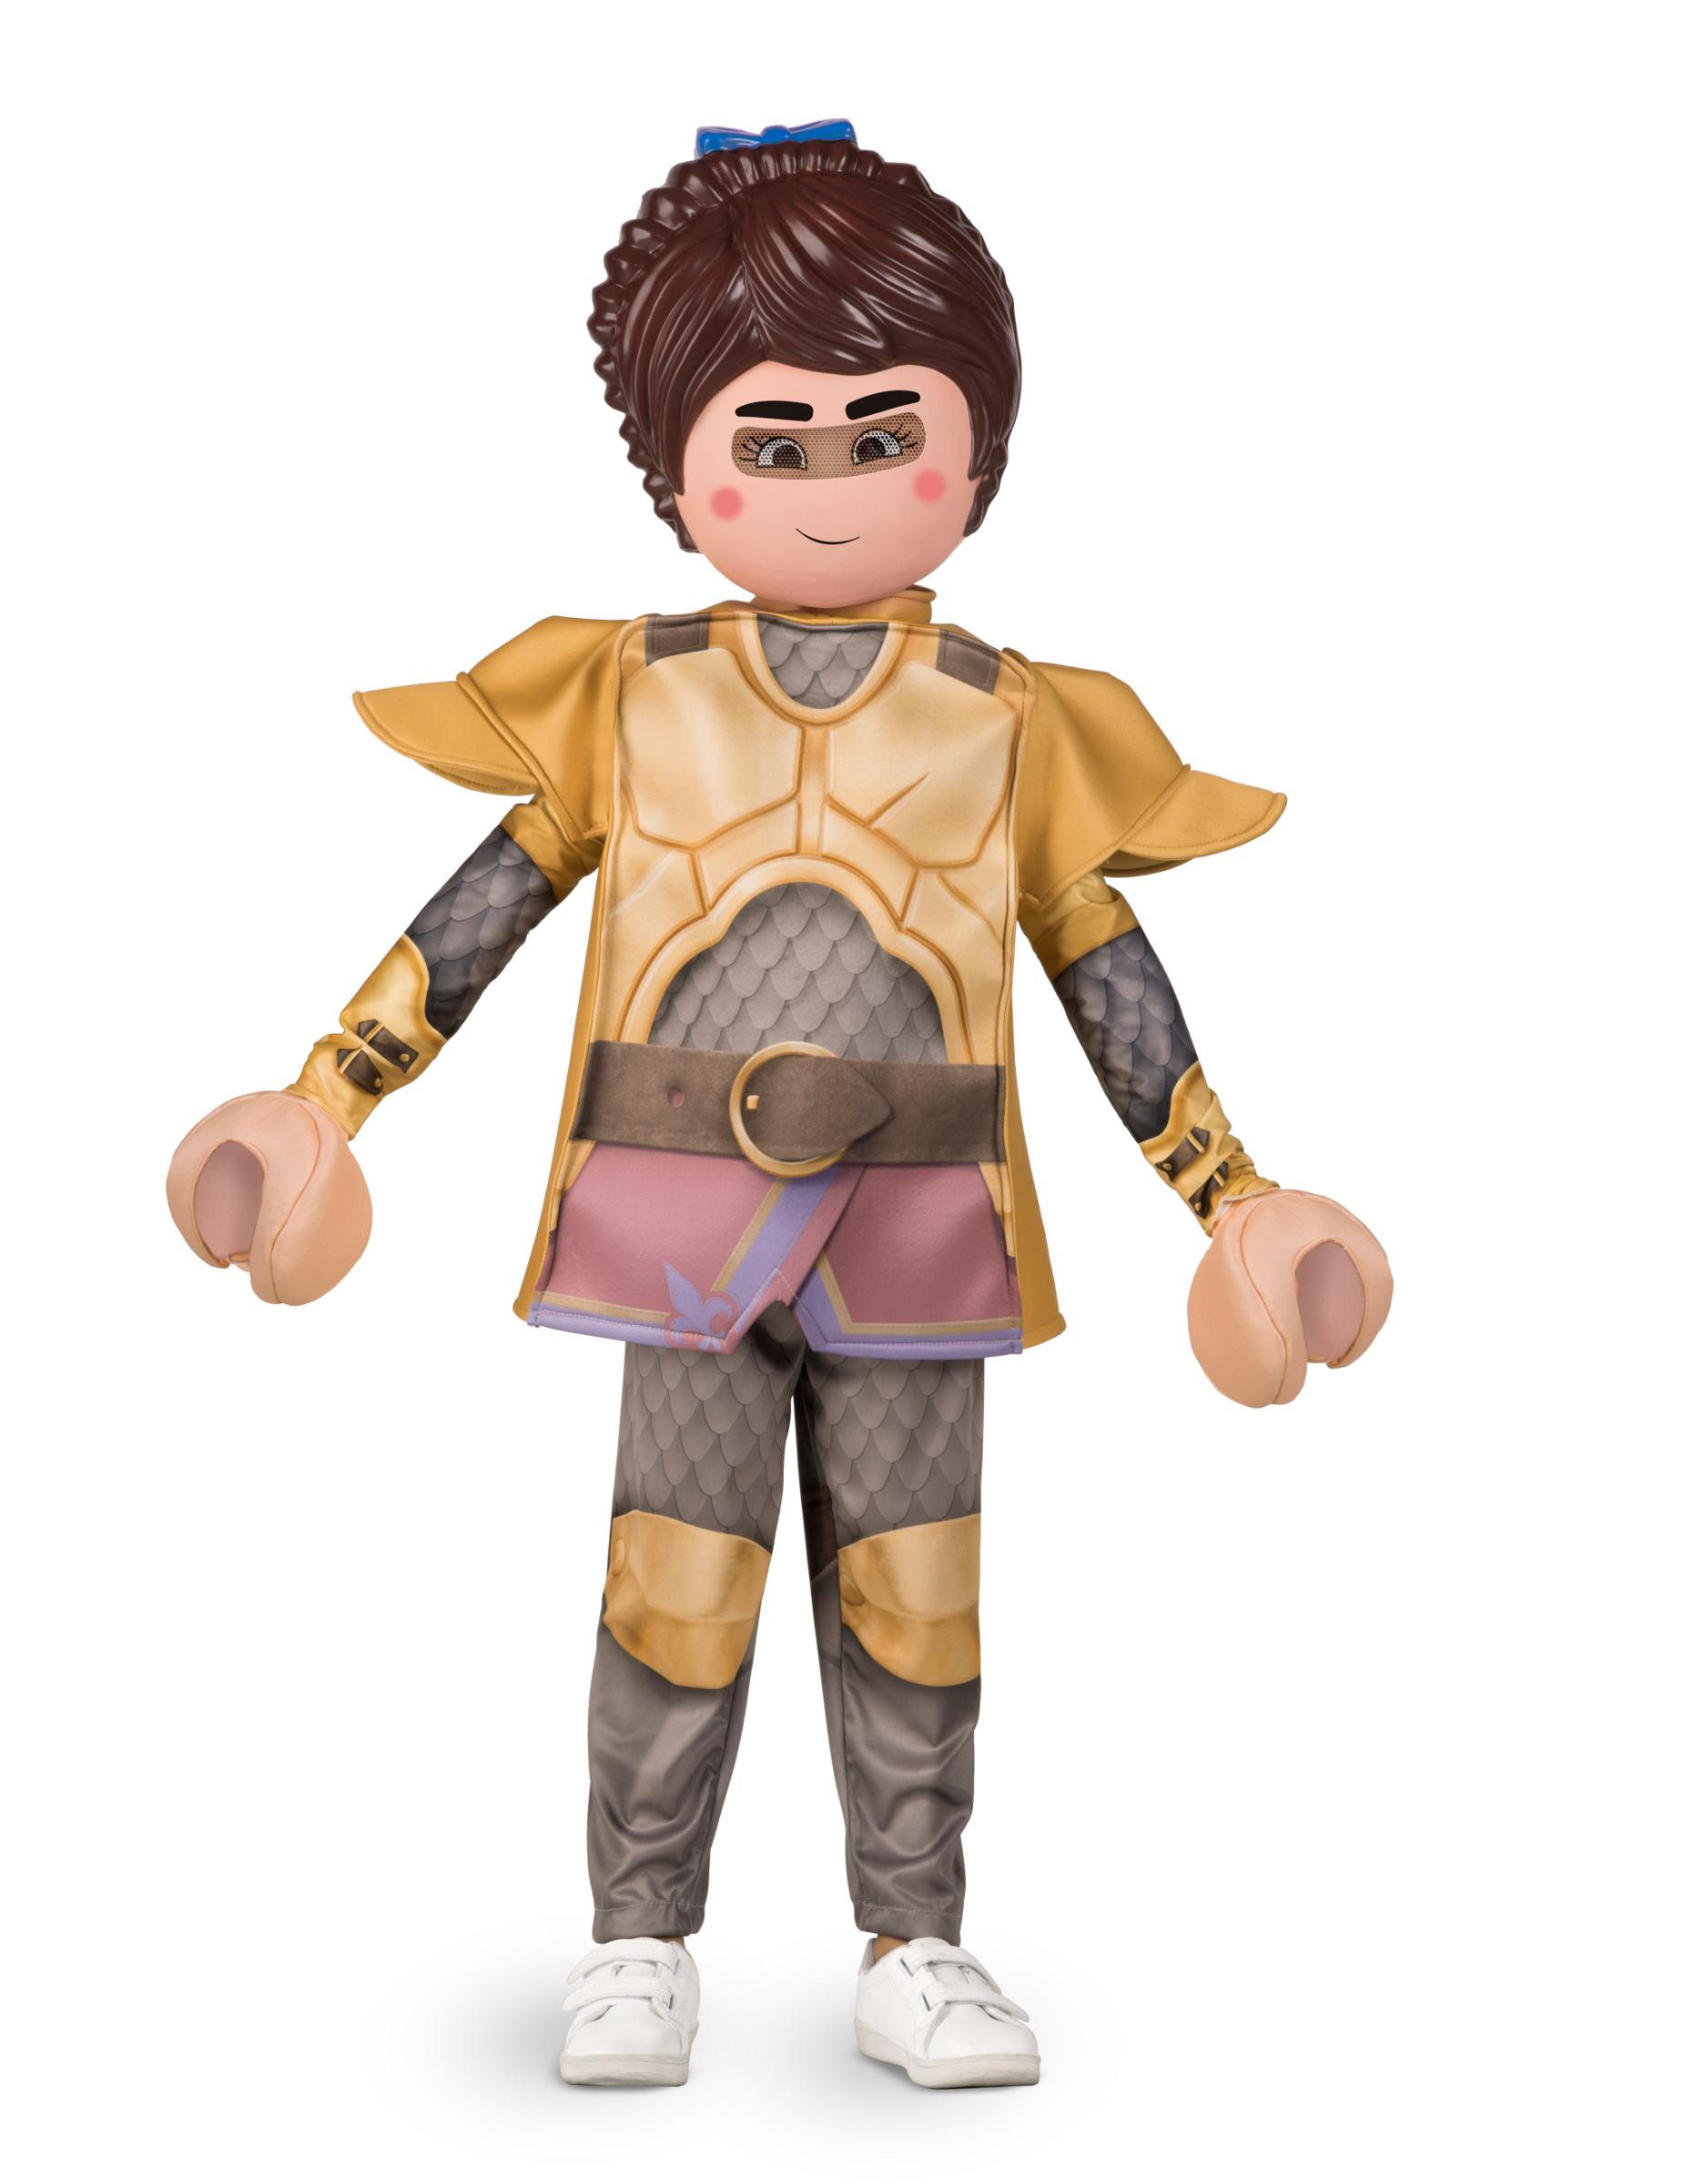 Marla™-Kostüm Playmobil der Film™ Faschingskostüm braun ...